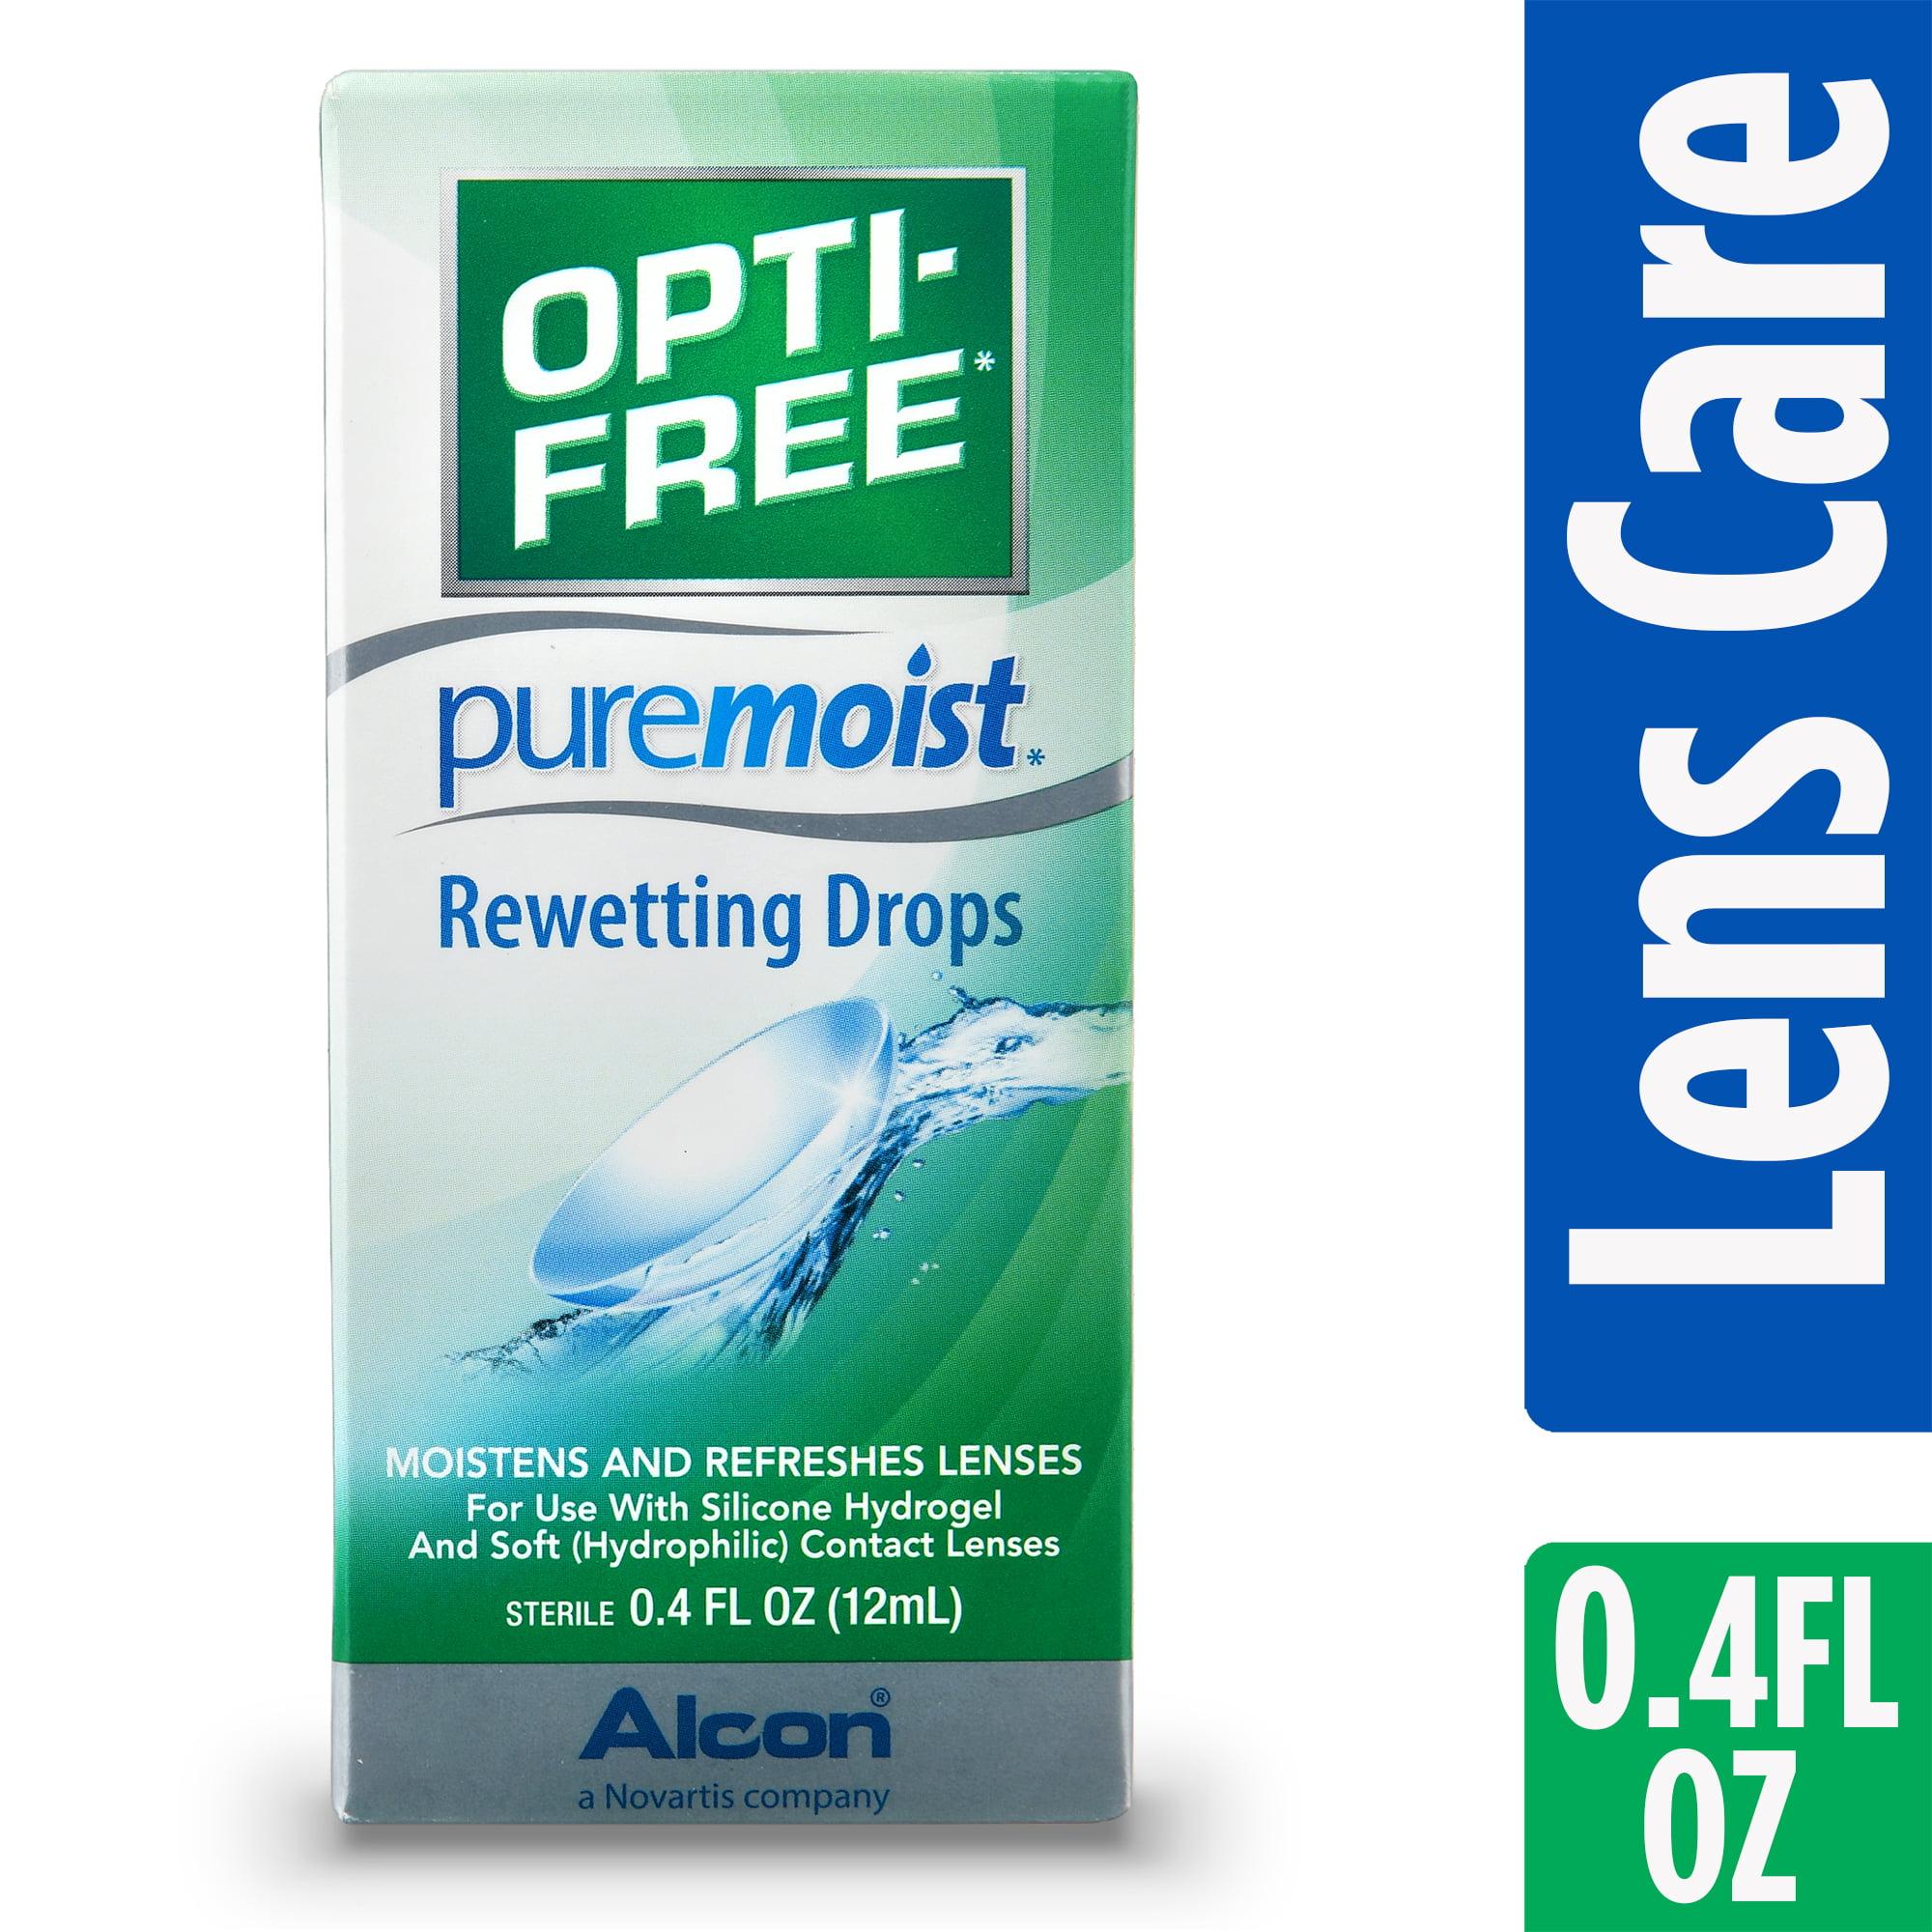 OPTI-FREE Puremoist Rewetting Drops for Contact Lenses, .4 Fl. Oz.